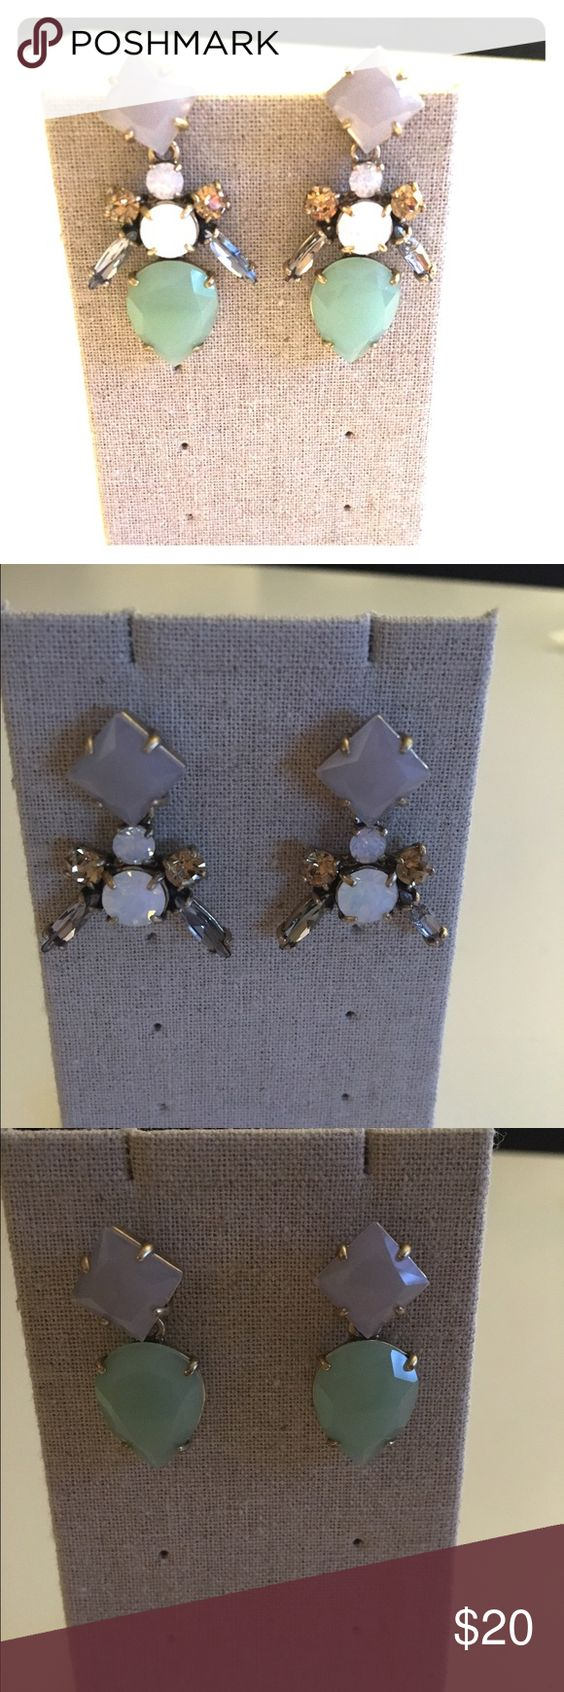 Versatile chandelier earings Post earrings, can be work 4 different ways, worn 1 time. Gold finish. Stella & Dot Jewelry Earrings